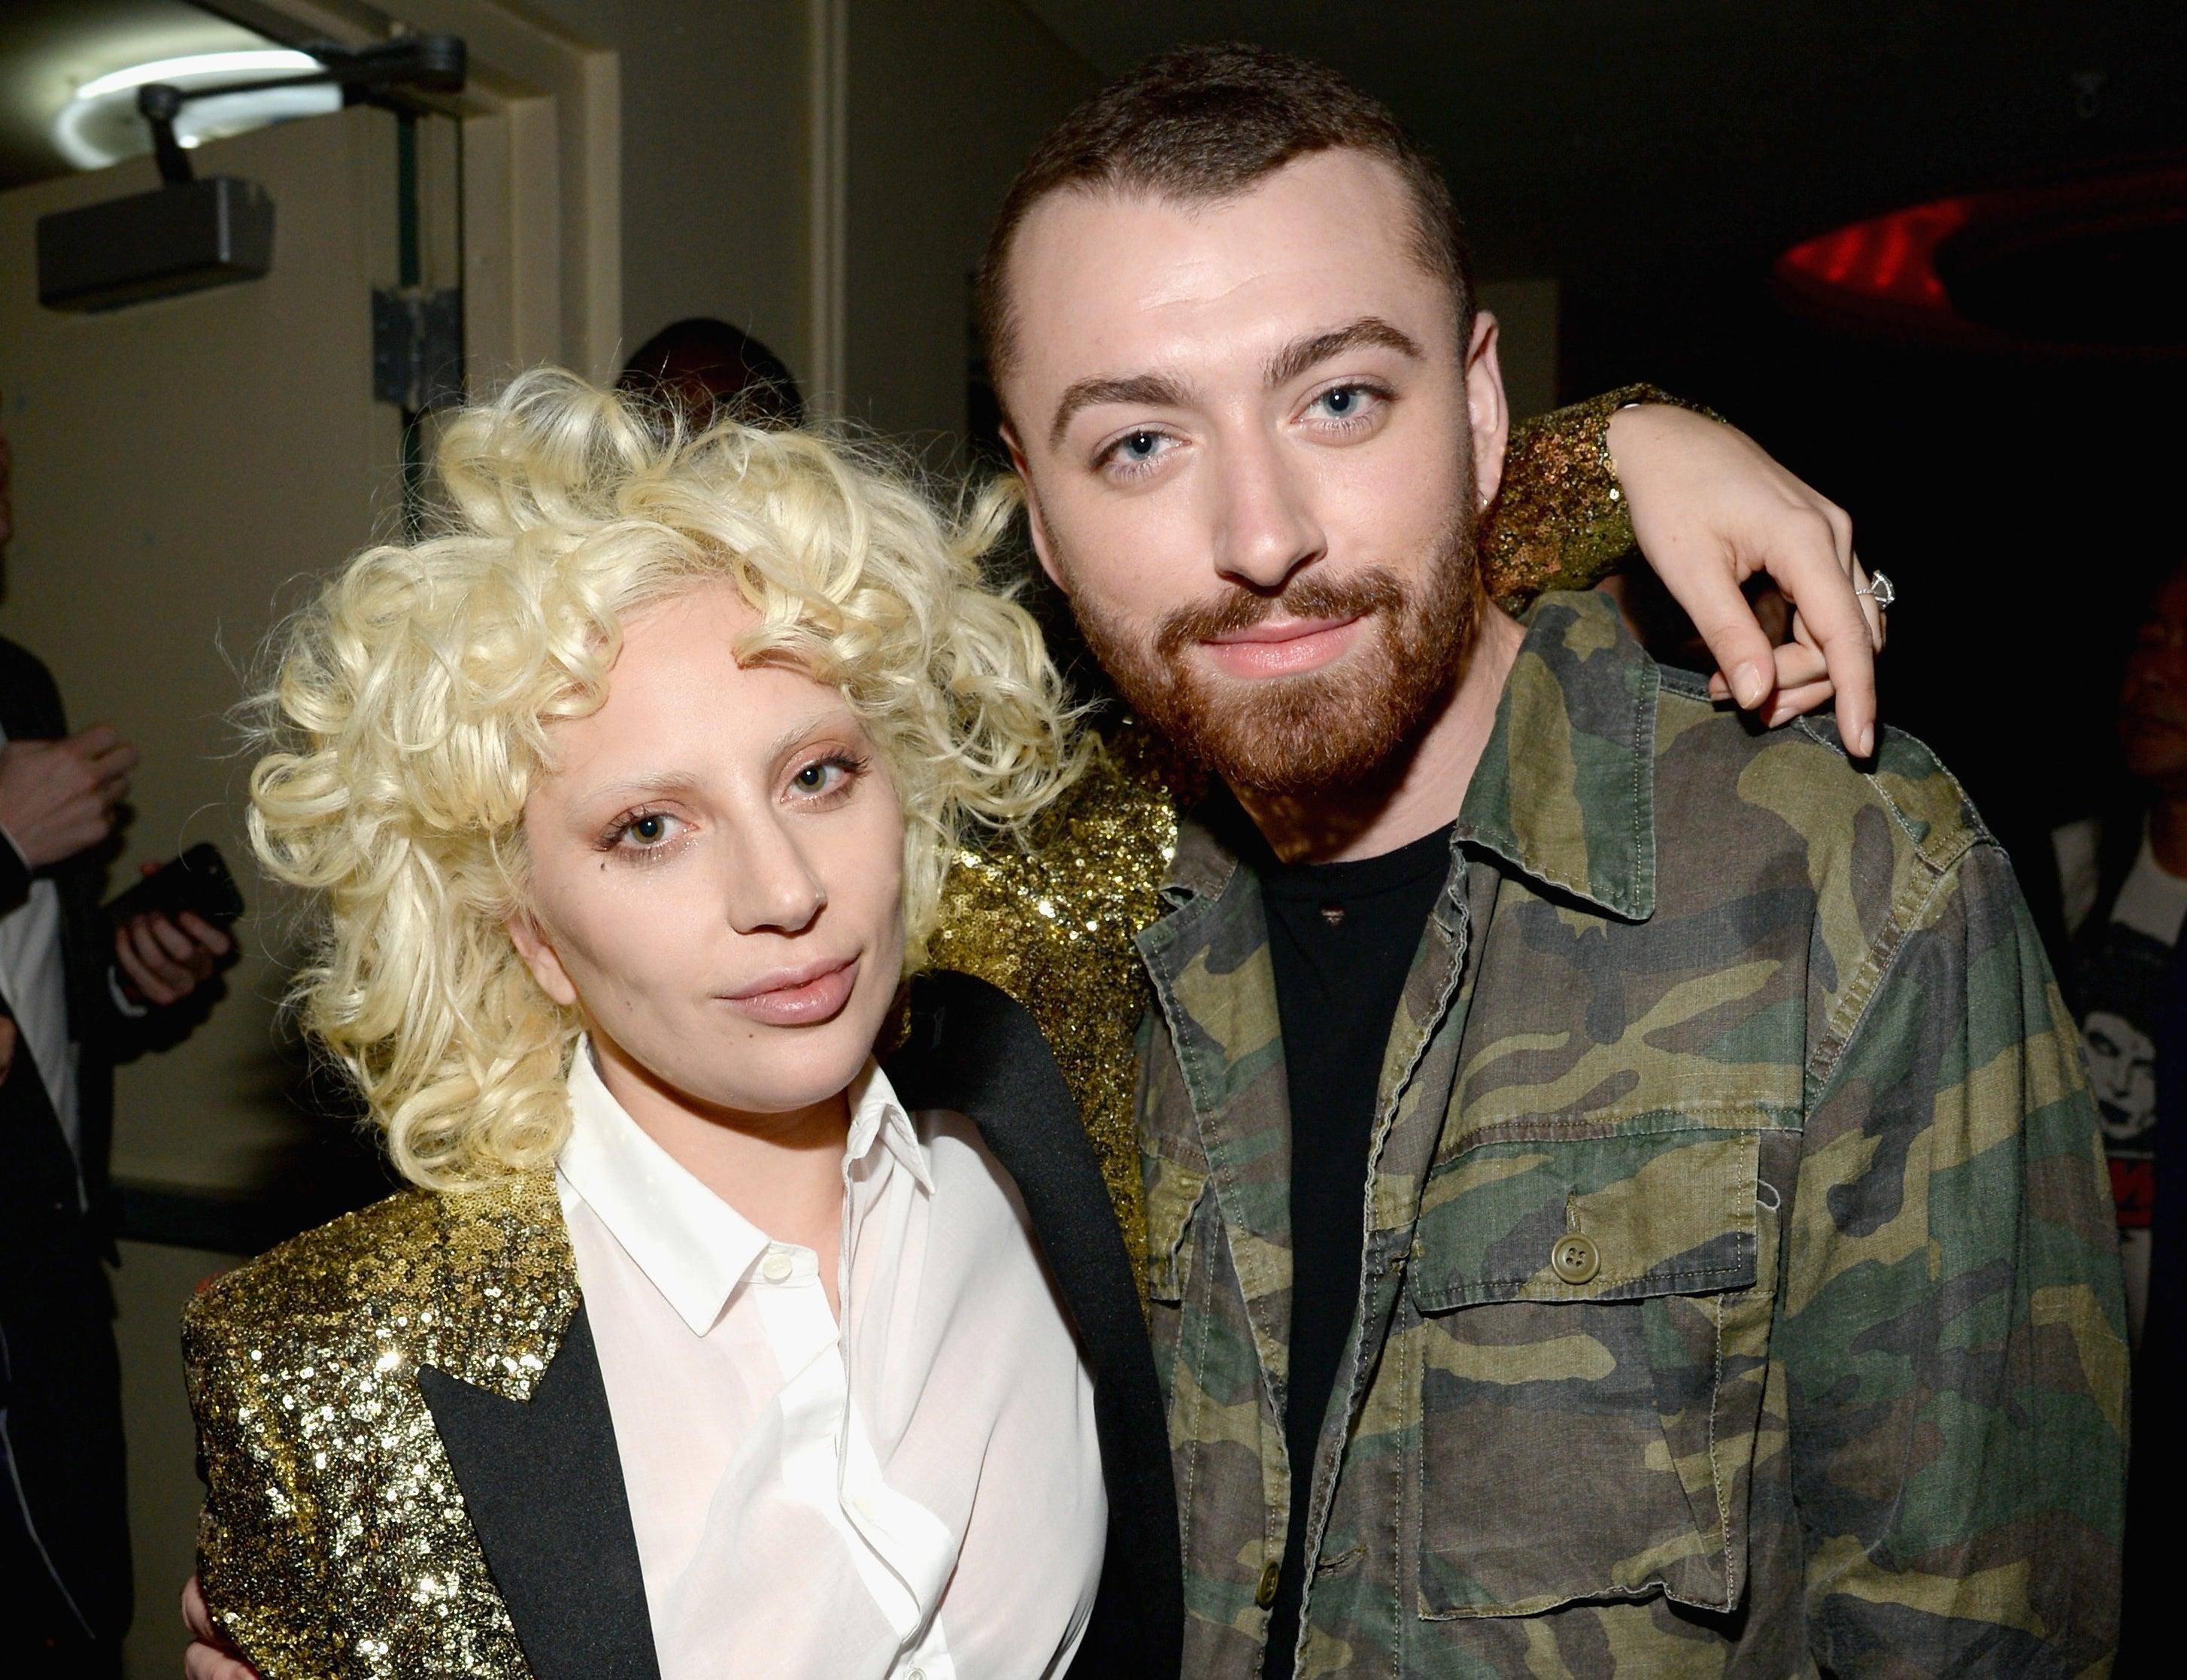 Lady Gaga and Sam Smith